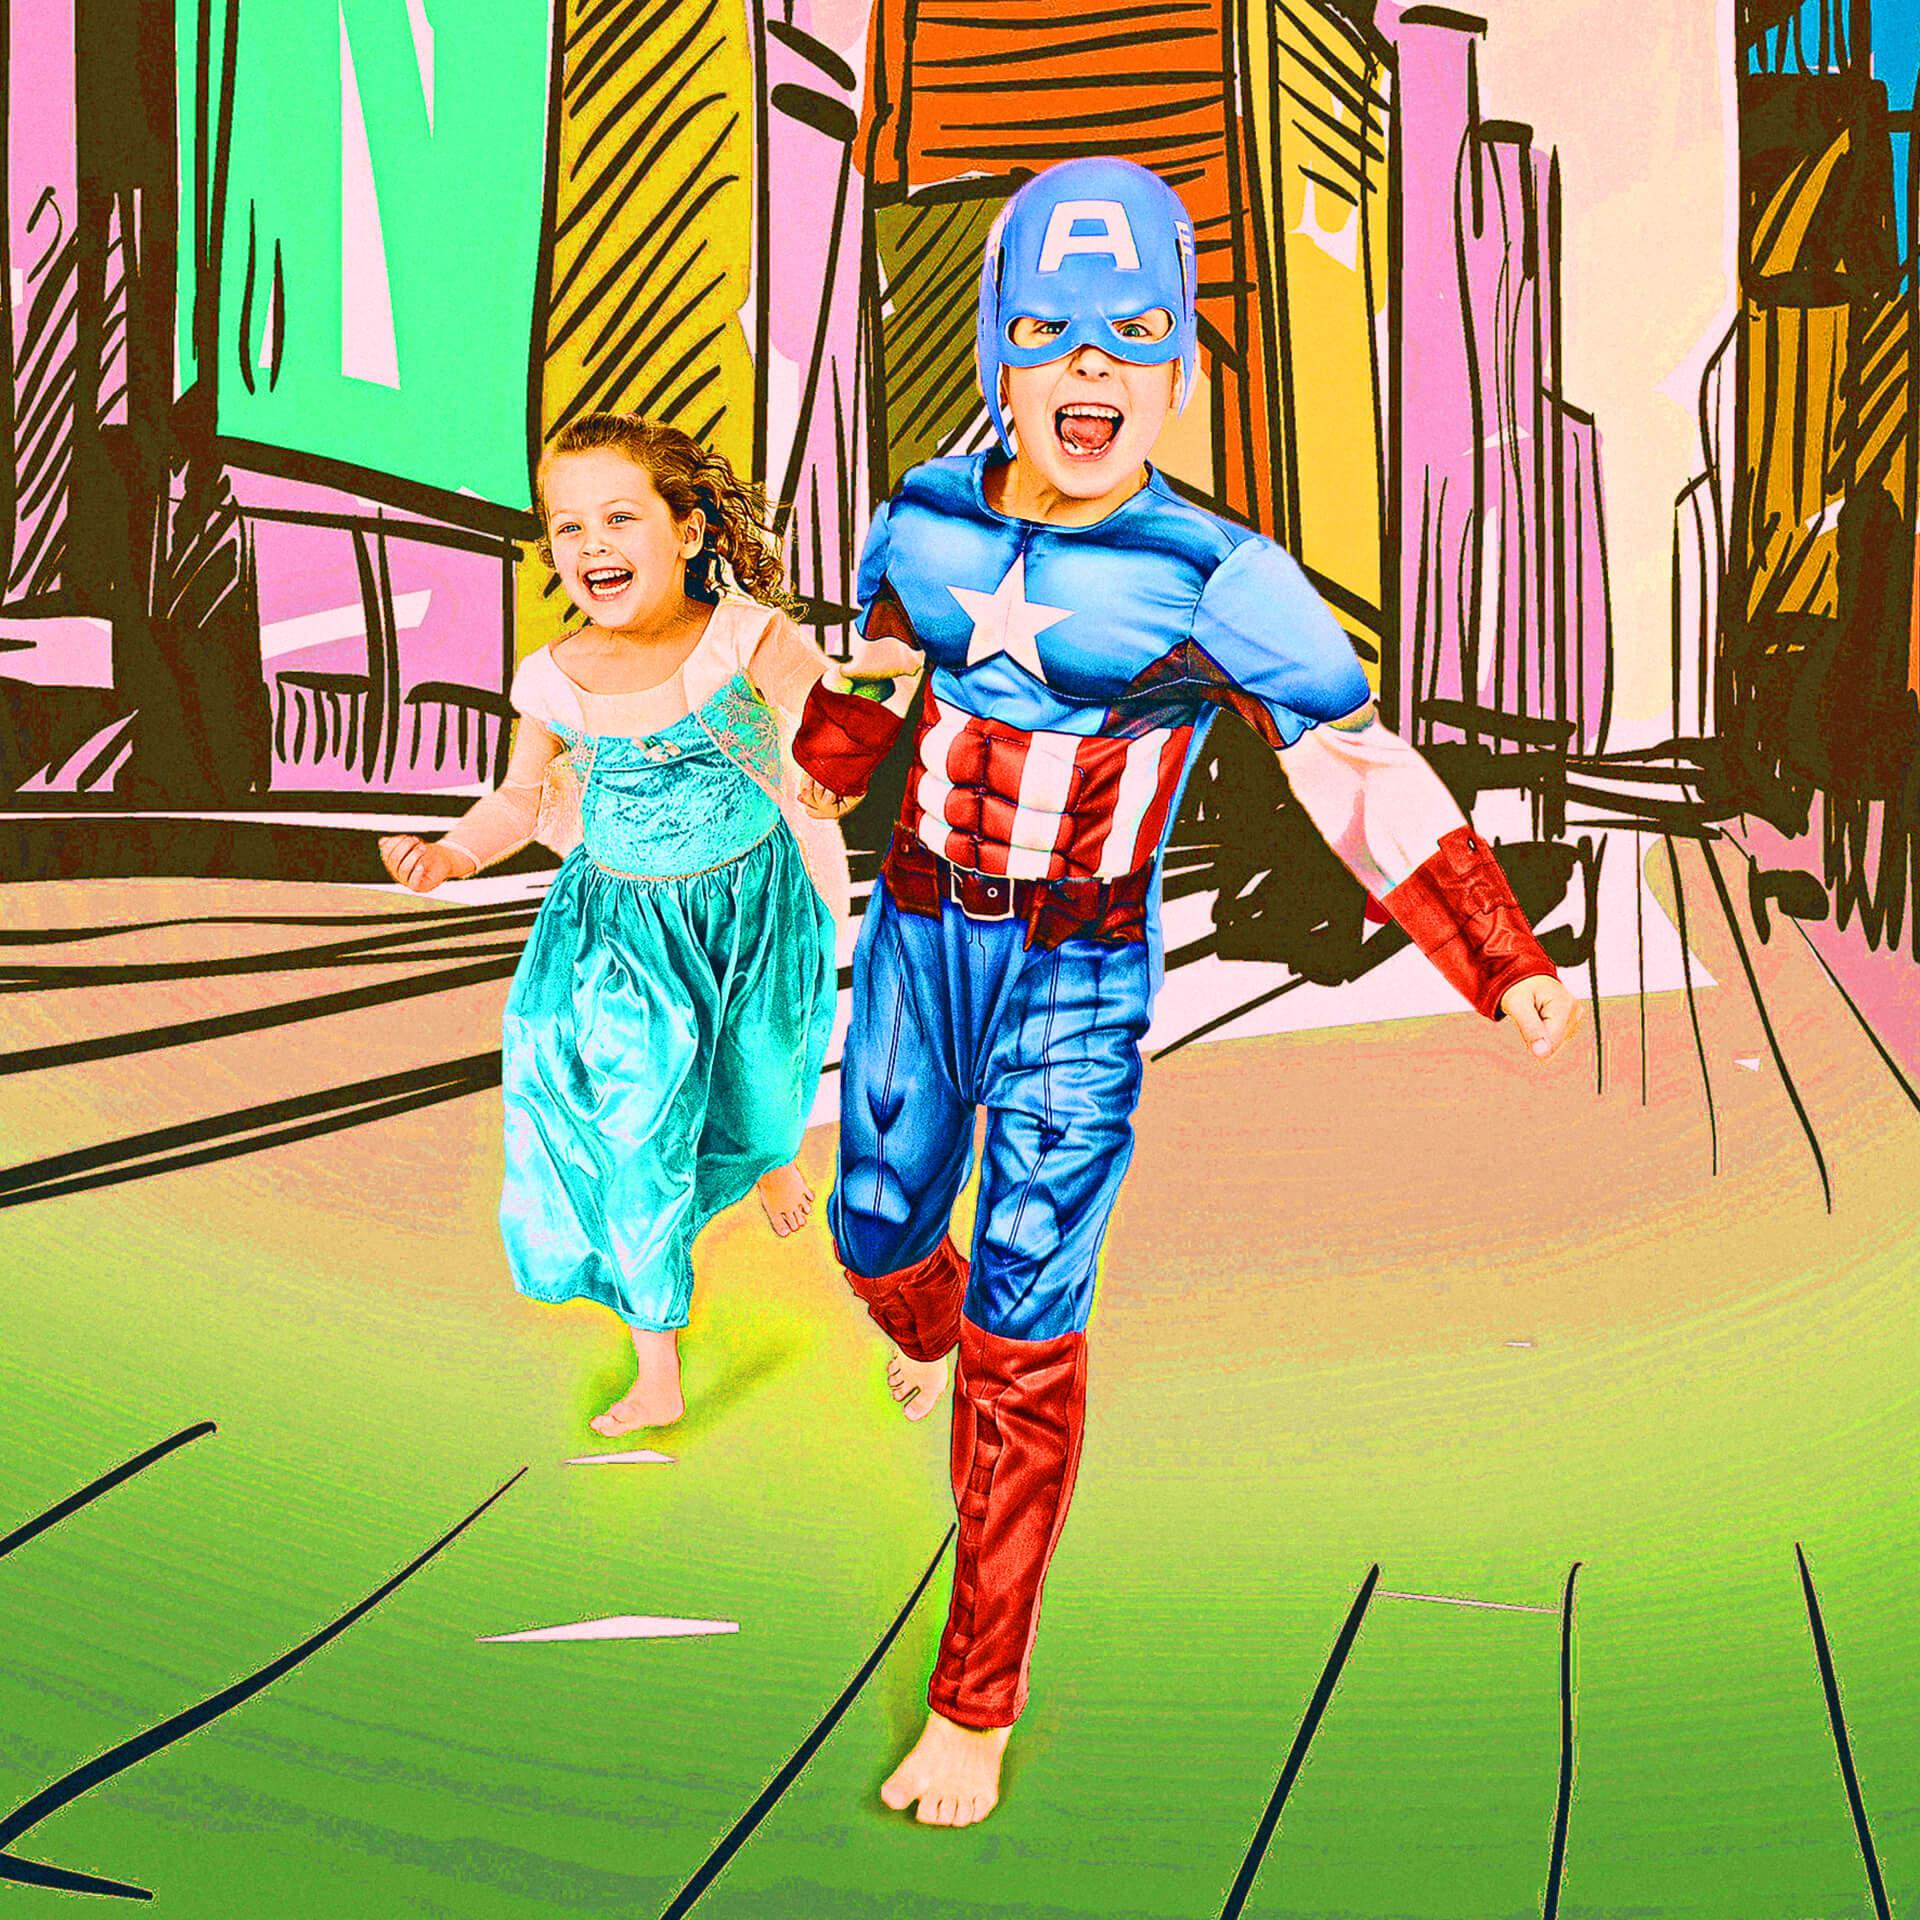 superhero photoshoots